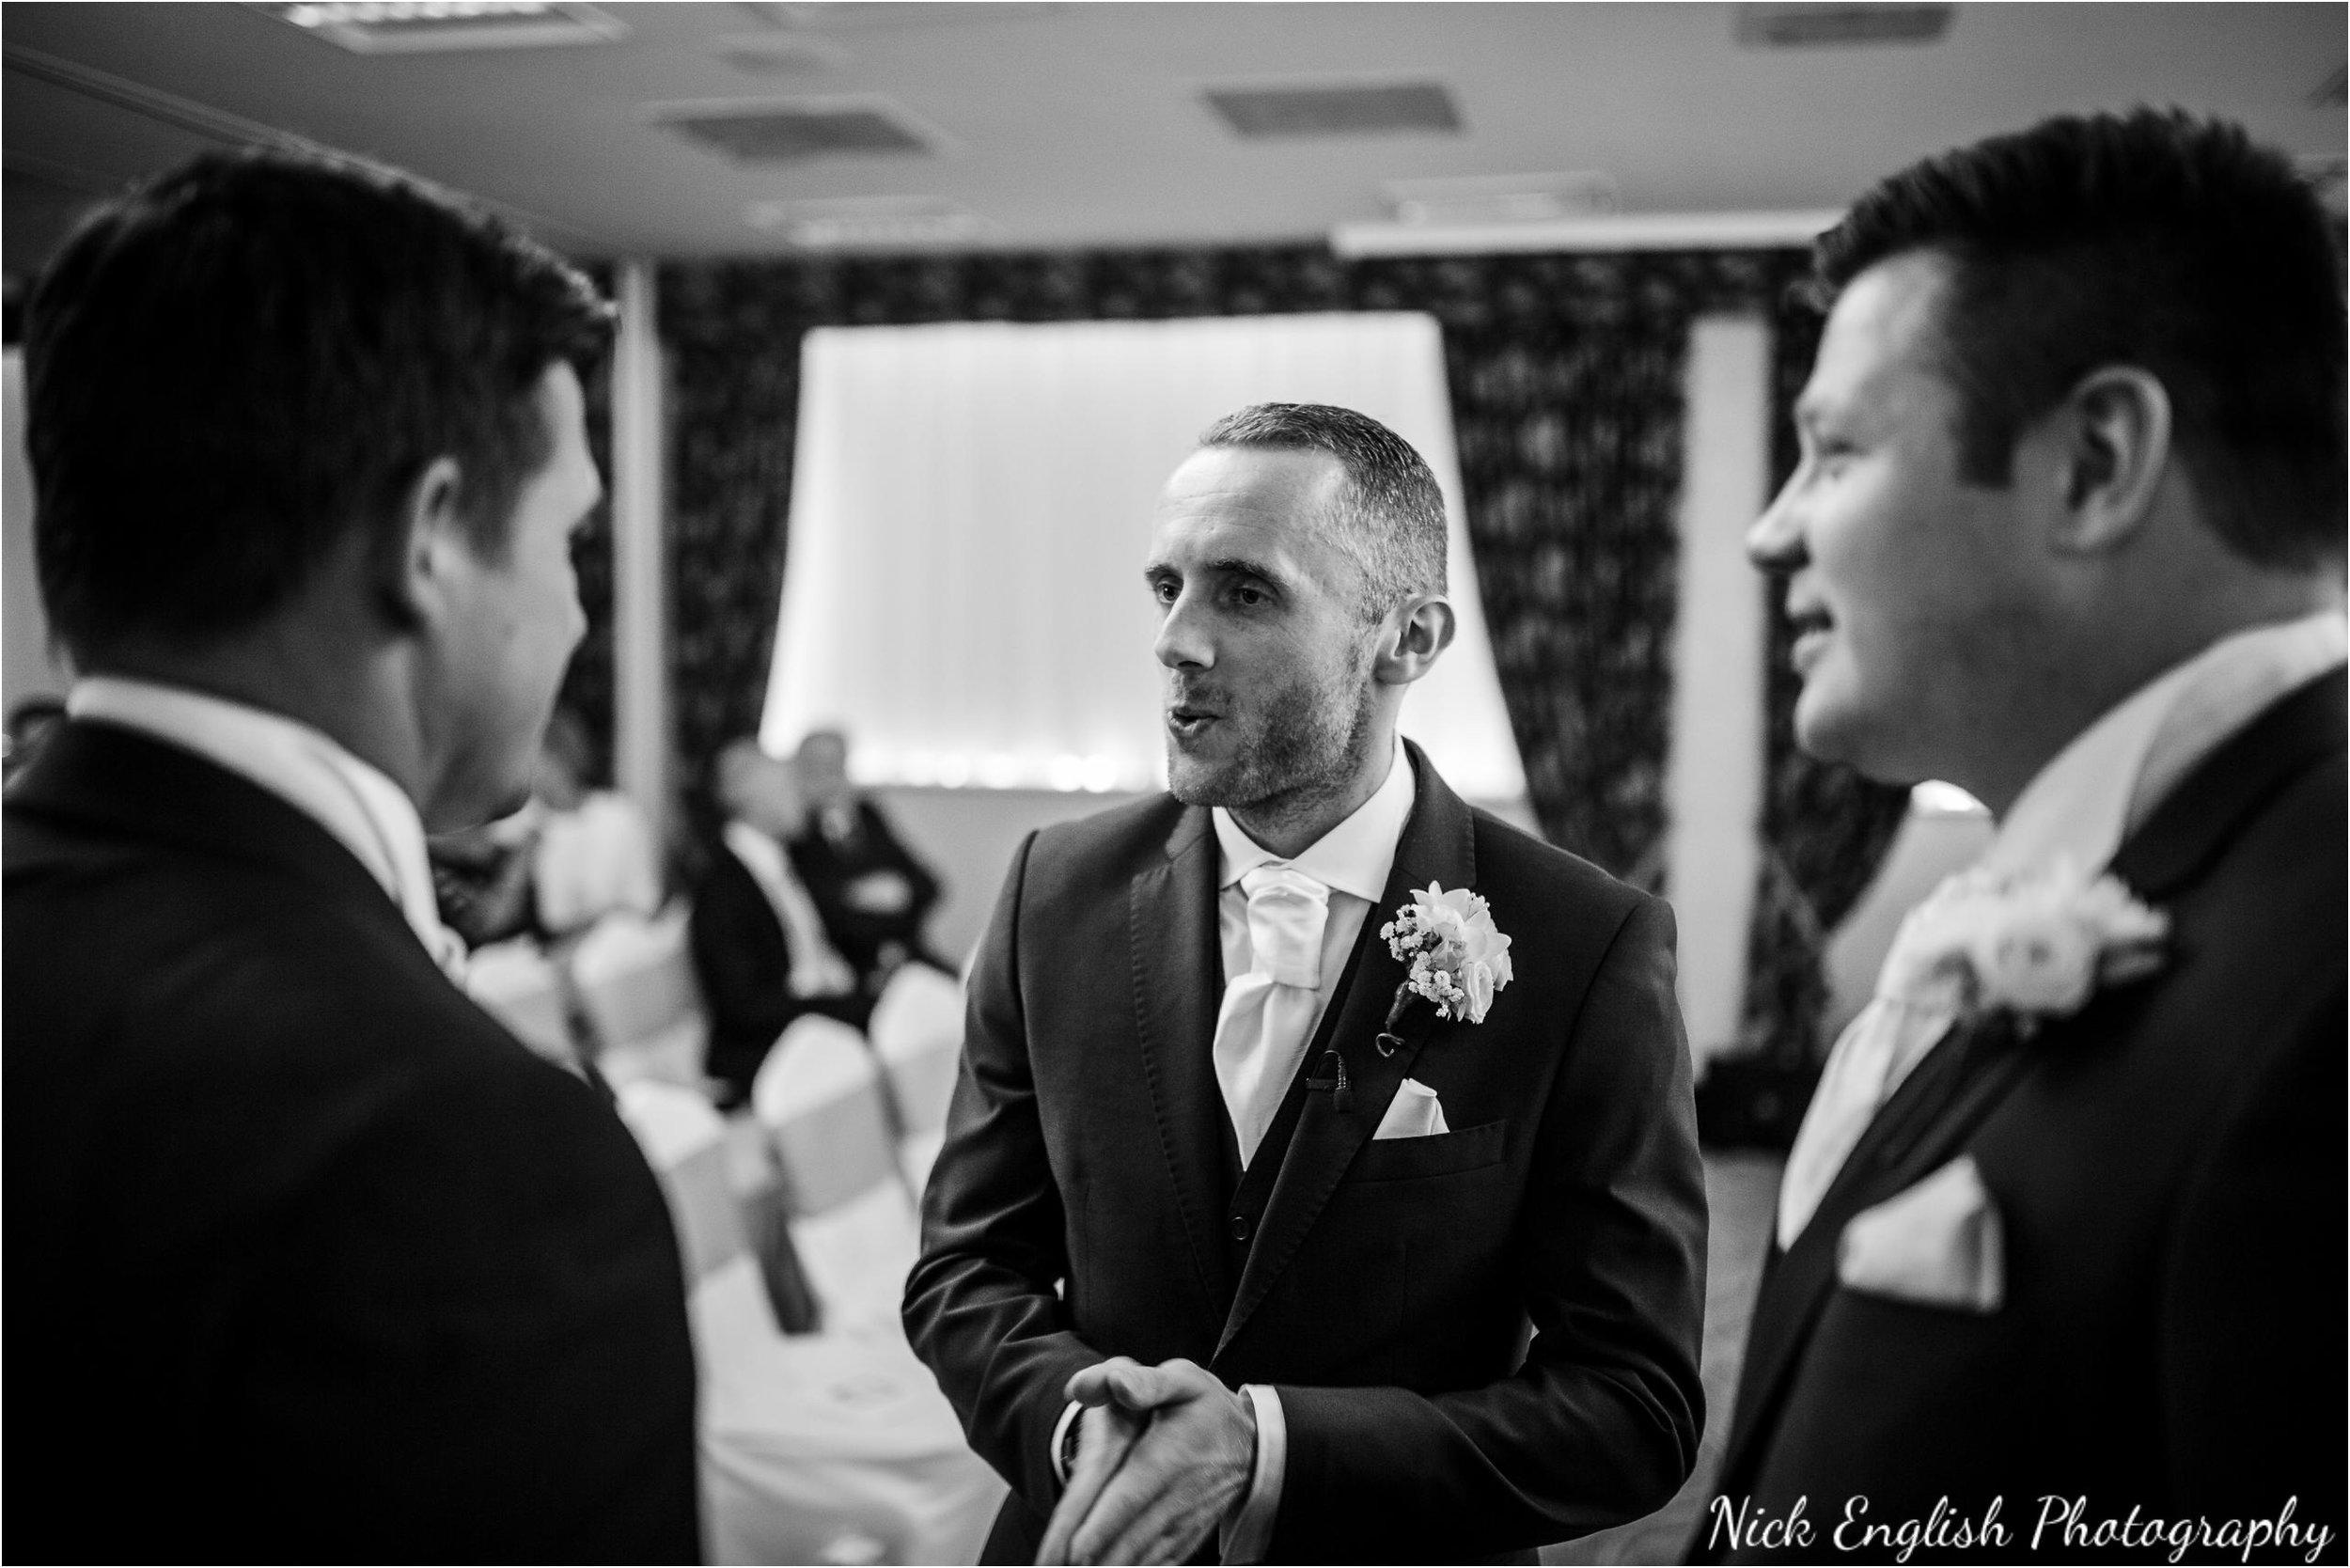 Emily David Wedding Photographs at Barton Grange Preston by Nick English Photography 52jpg.jpeg